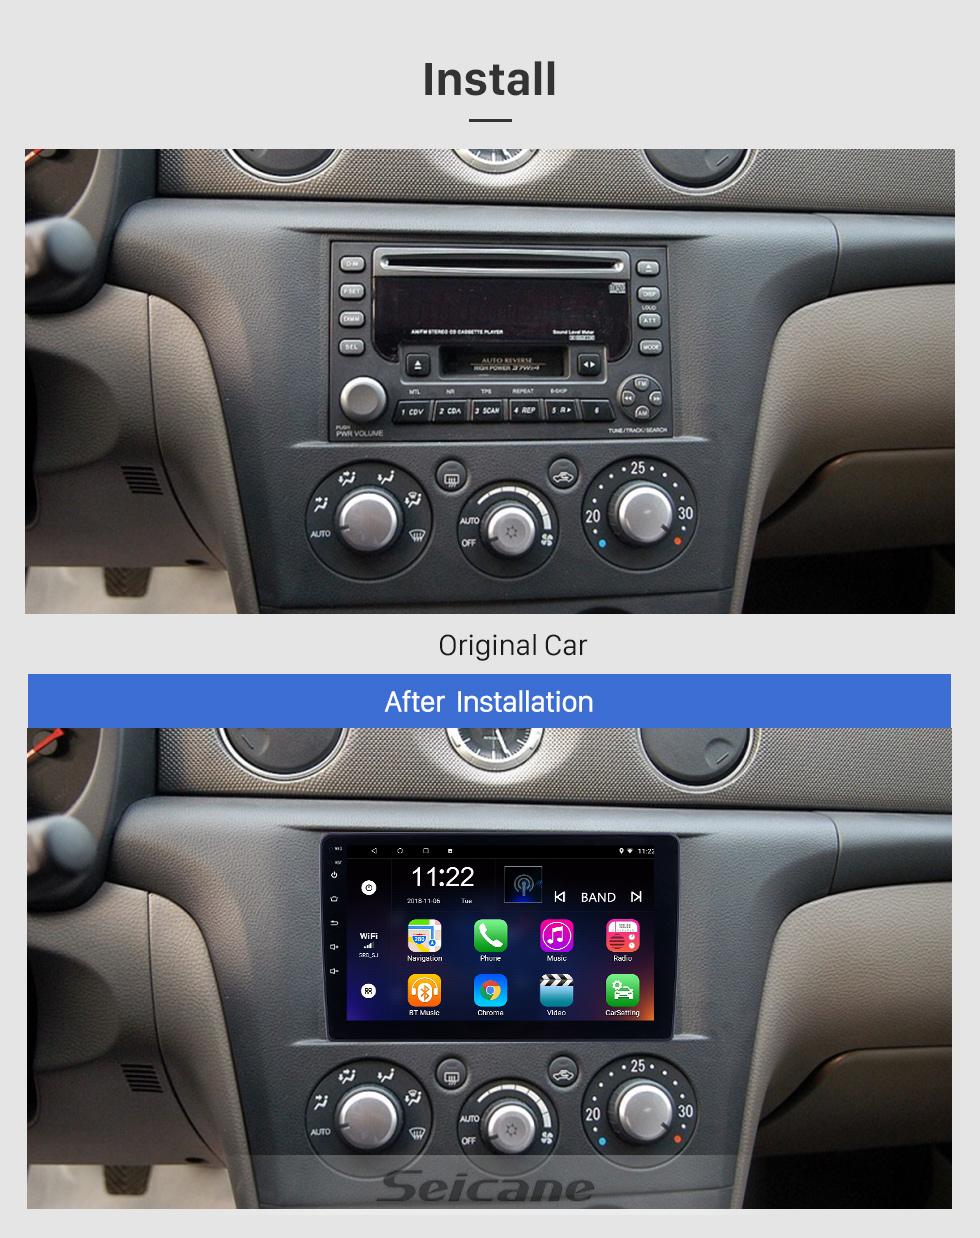 Seicane 2004-2007 Mitsubishi OUTLANDER 9 Zoll Android 10.0 HD Touchscreen Bluetooth Radio GPS-Navigationssystem Stereo USB AUX Unterstützung Carplay 3G Wlan Rückfahrkamera